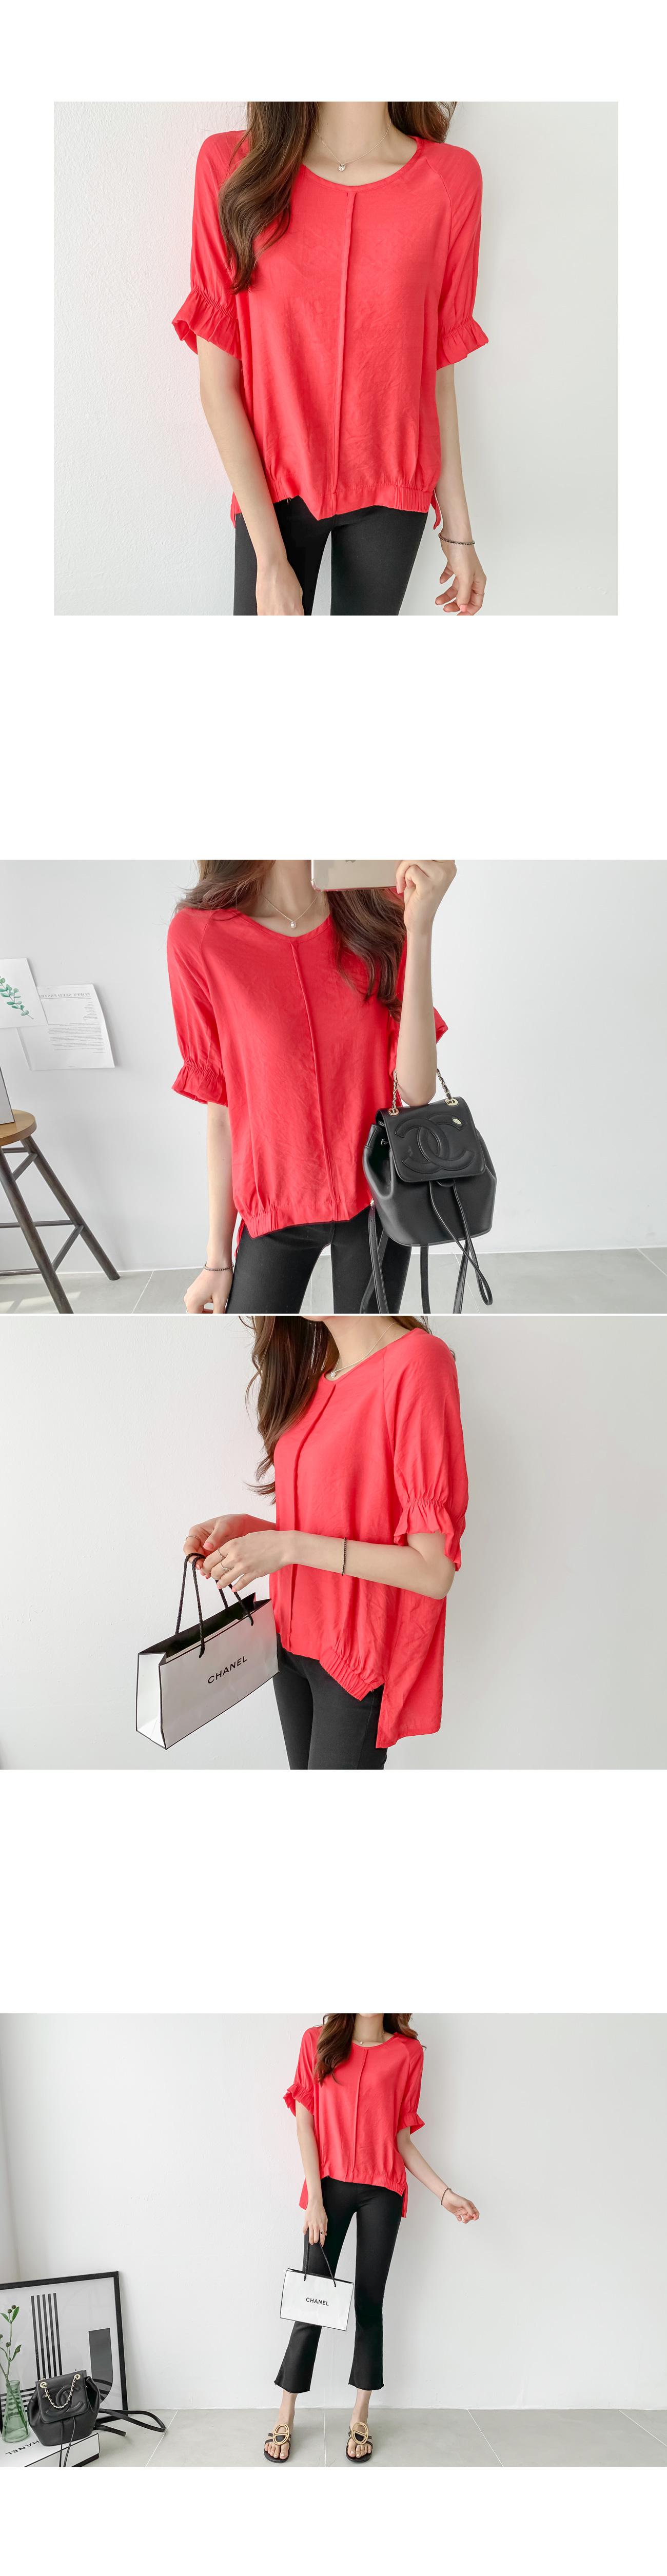 Puff ruffle sleeve blouse #44570